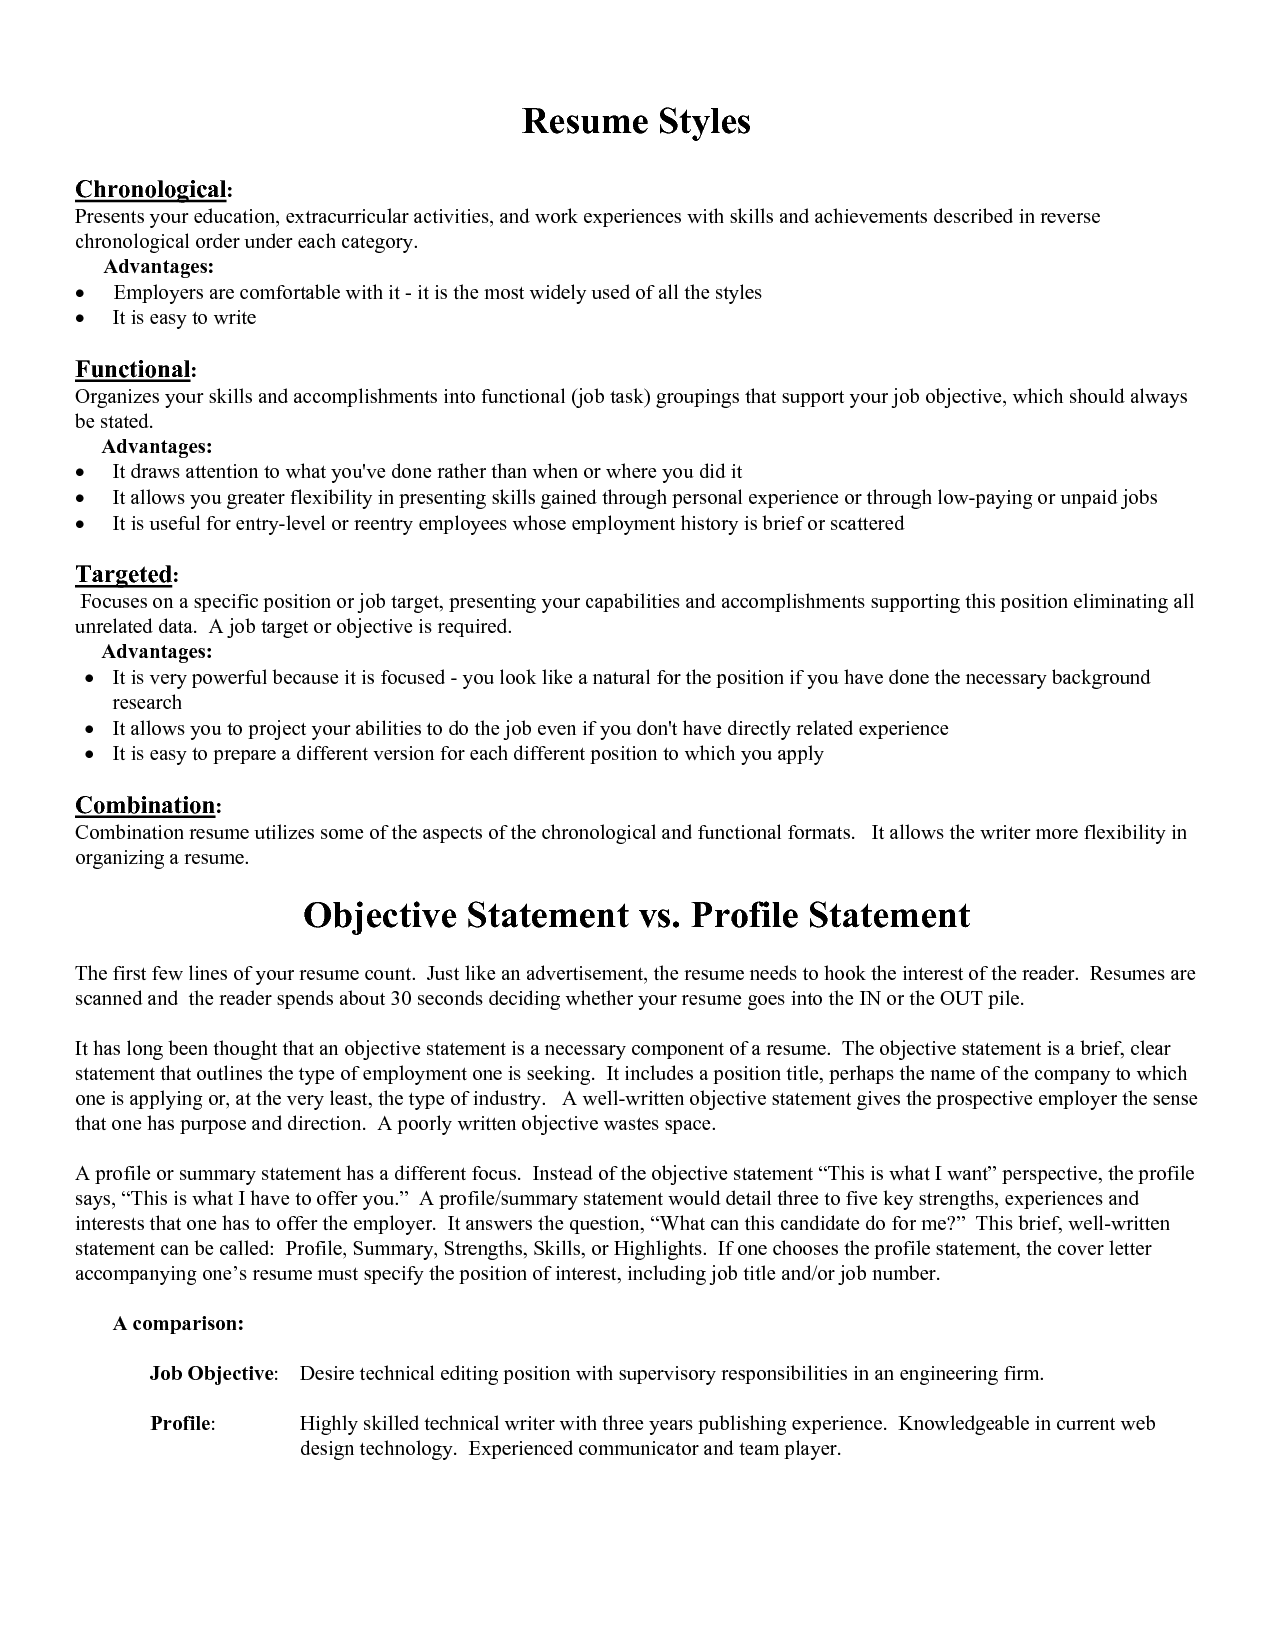 objective resume for healthcare http//www.resumecareer d pharmacy format state your job application skills in marketing